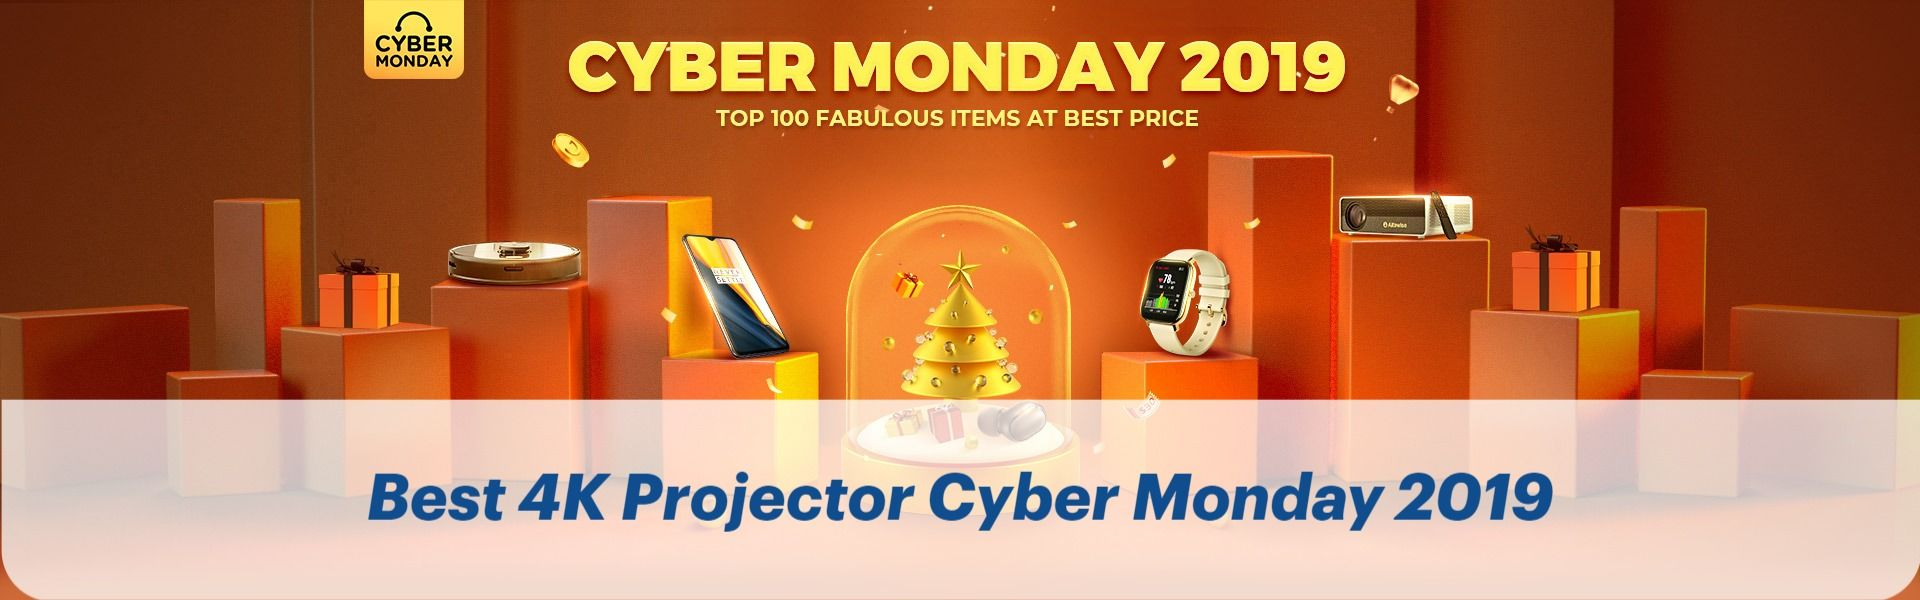 4k Projector Cyber Monday 2020 Black Friday Cyber Monday Best Black Friday